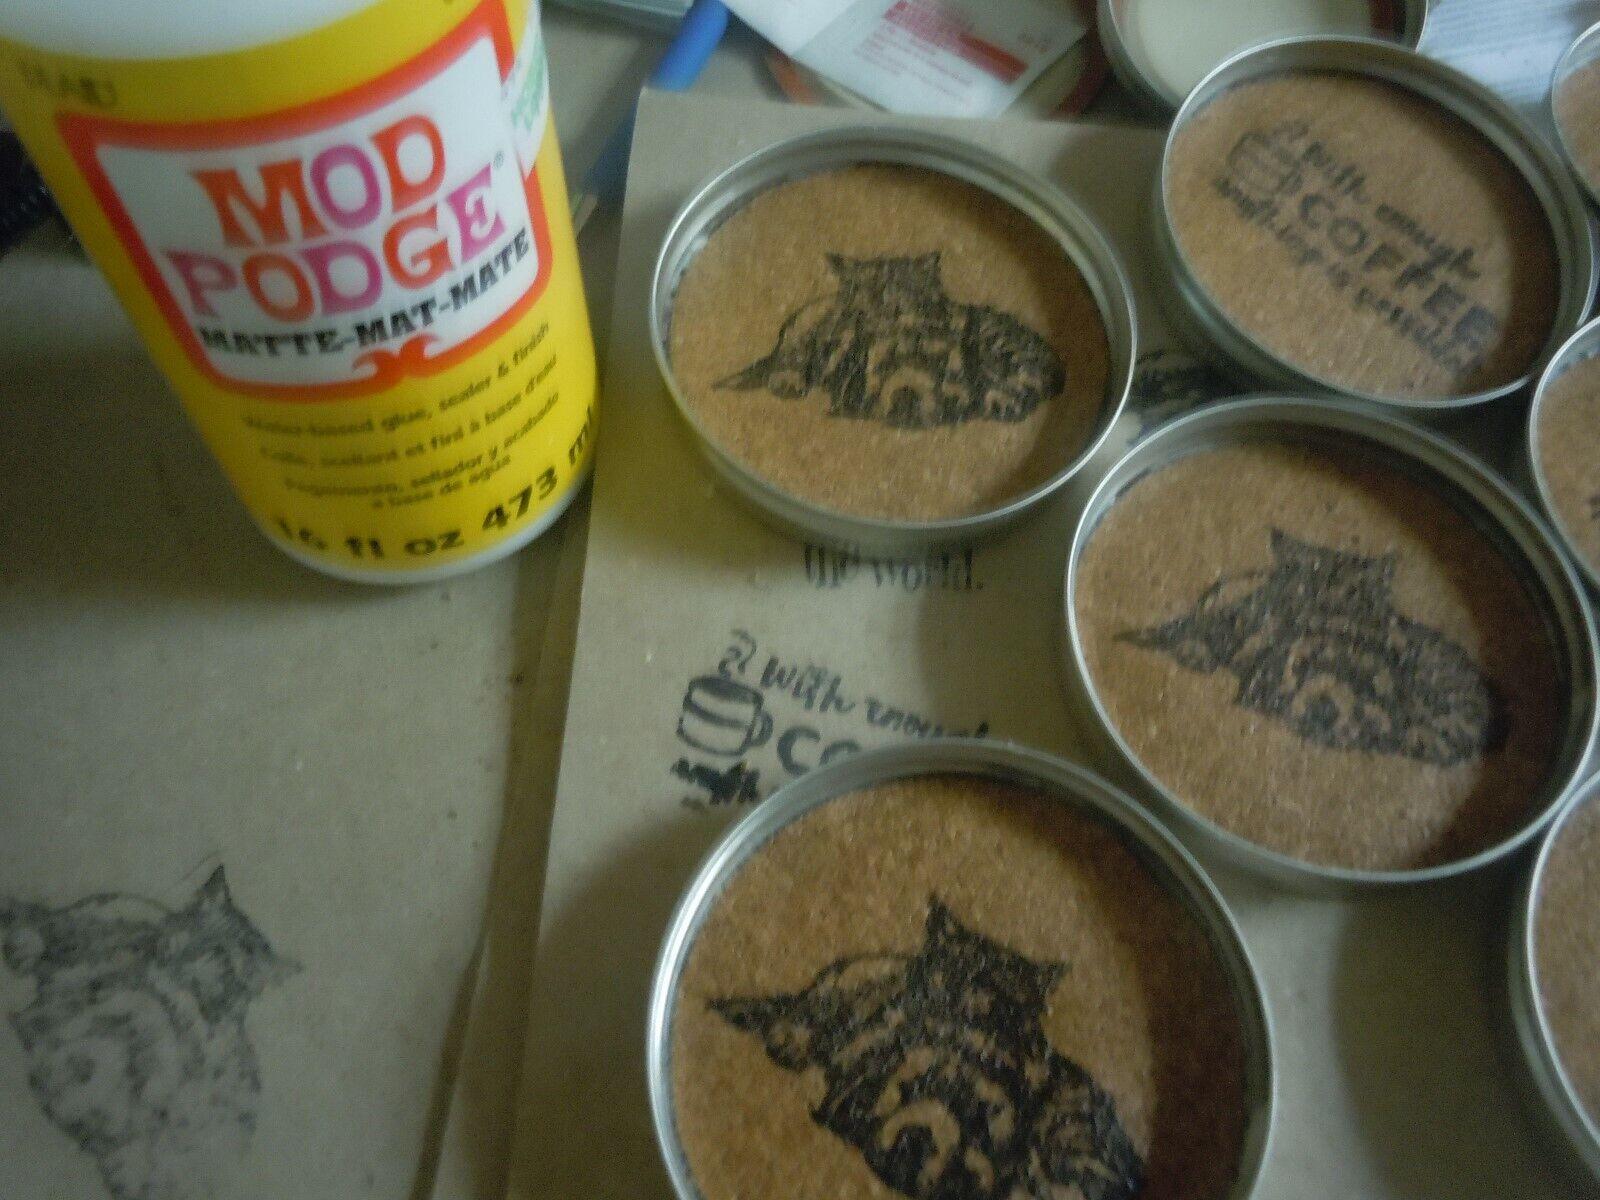 COASTER SET RT 66 MASON JAR LID Moisture absorbing cork Waterproof Ink Set of 4